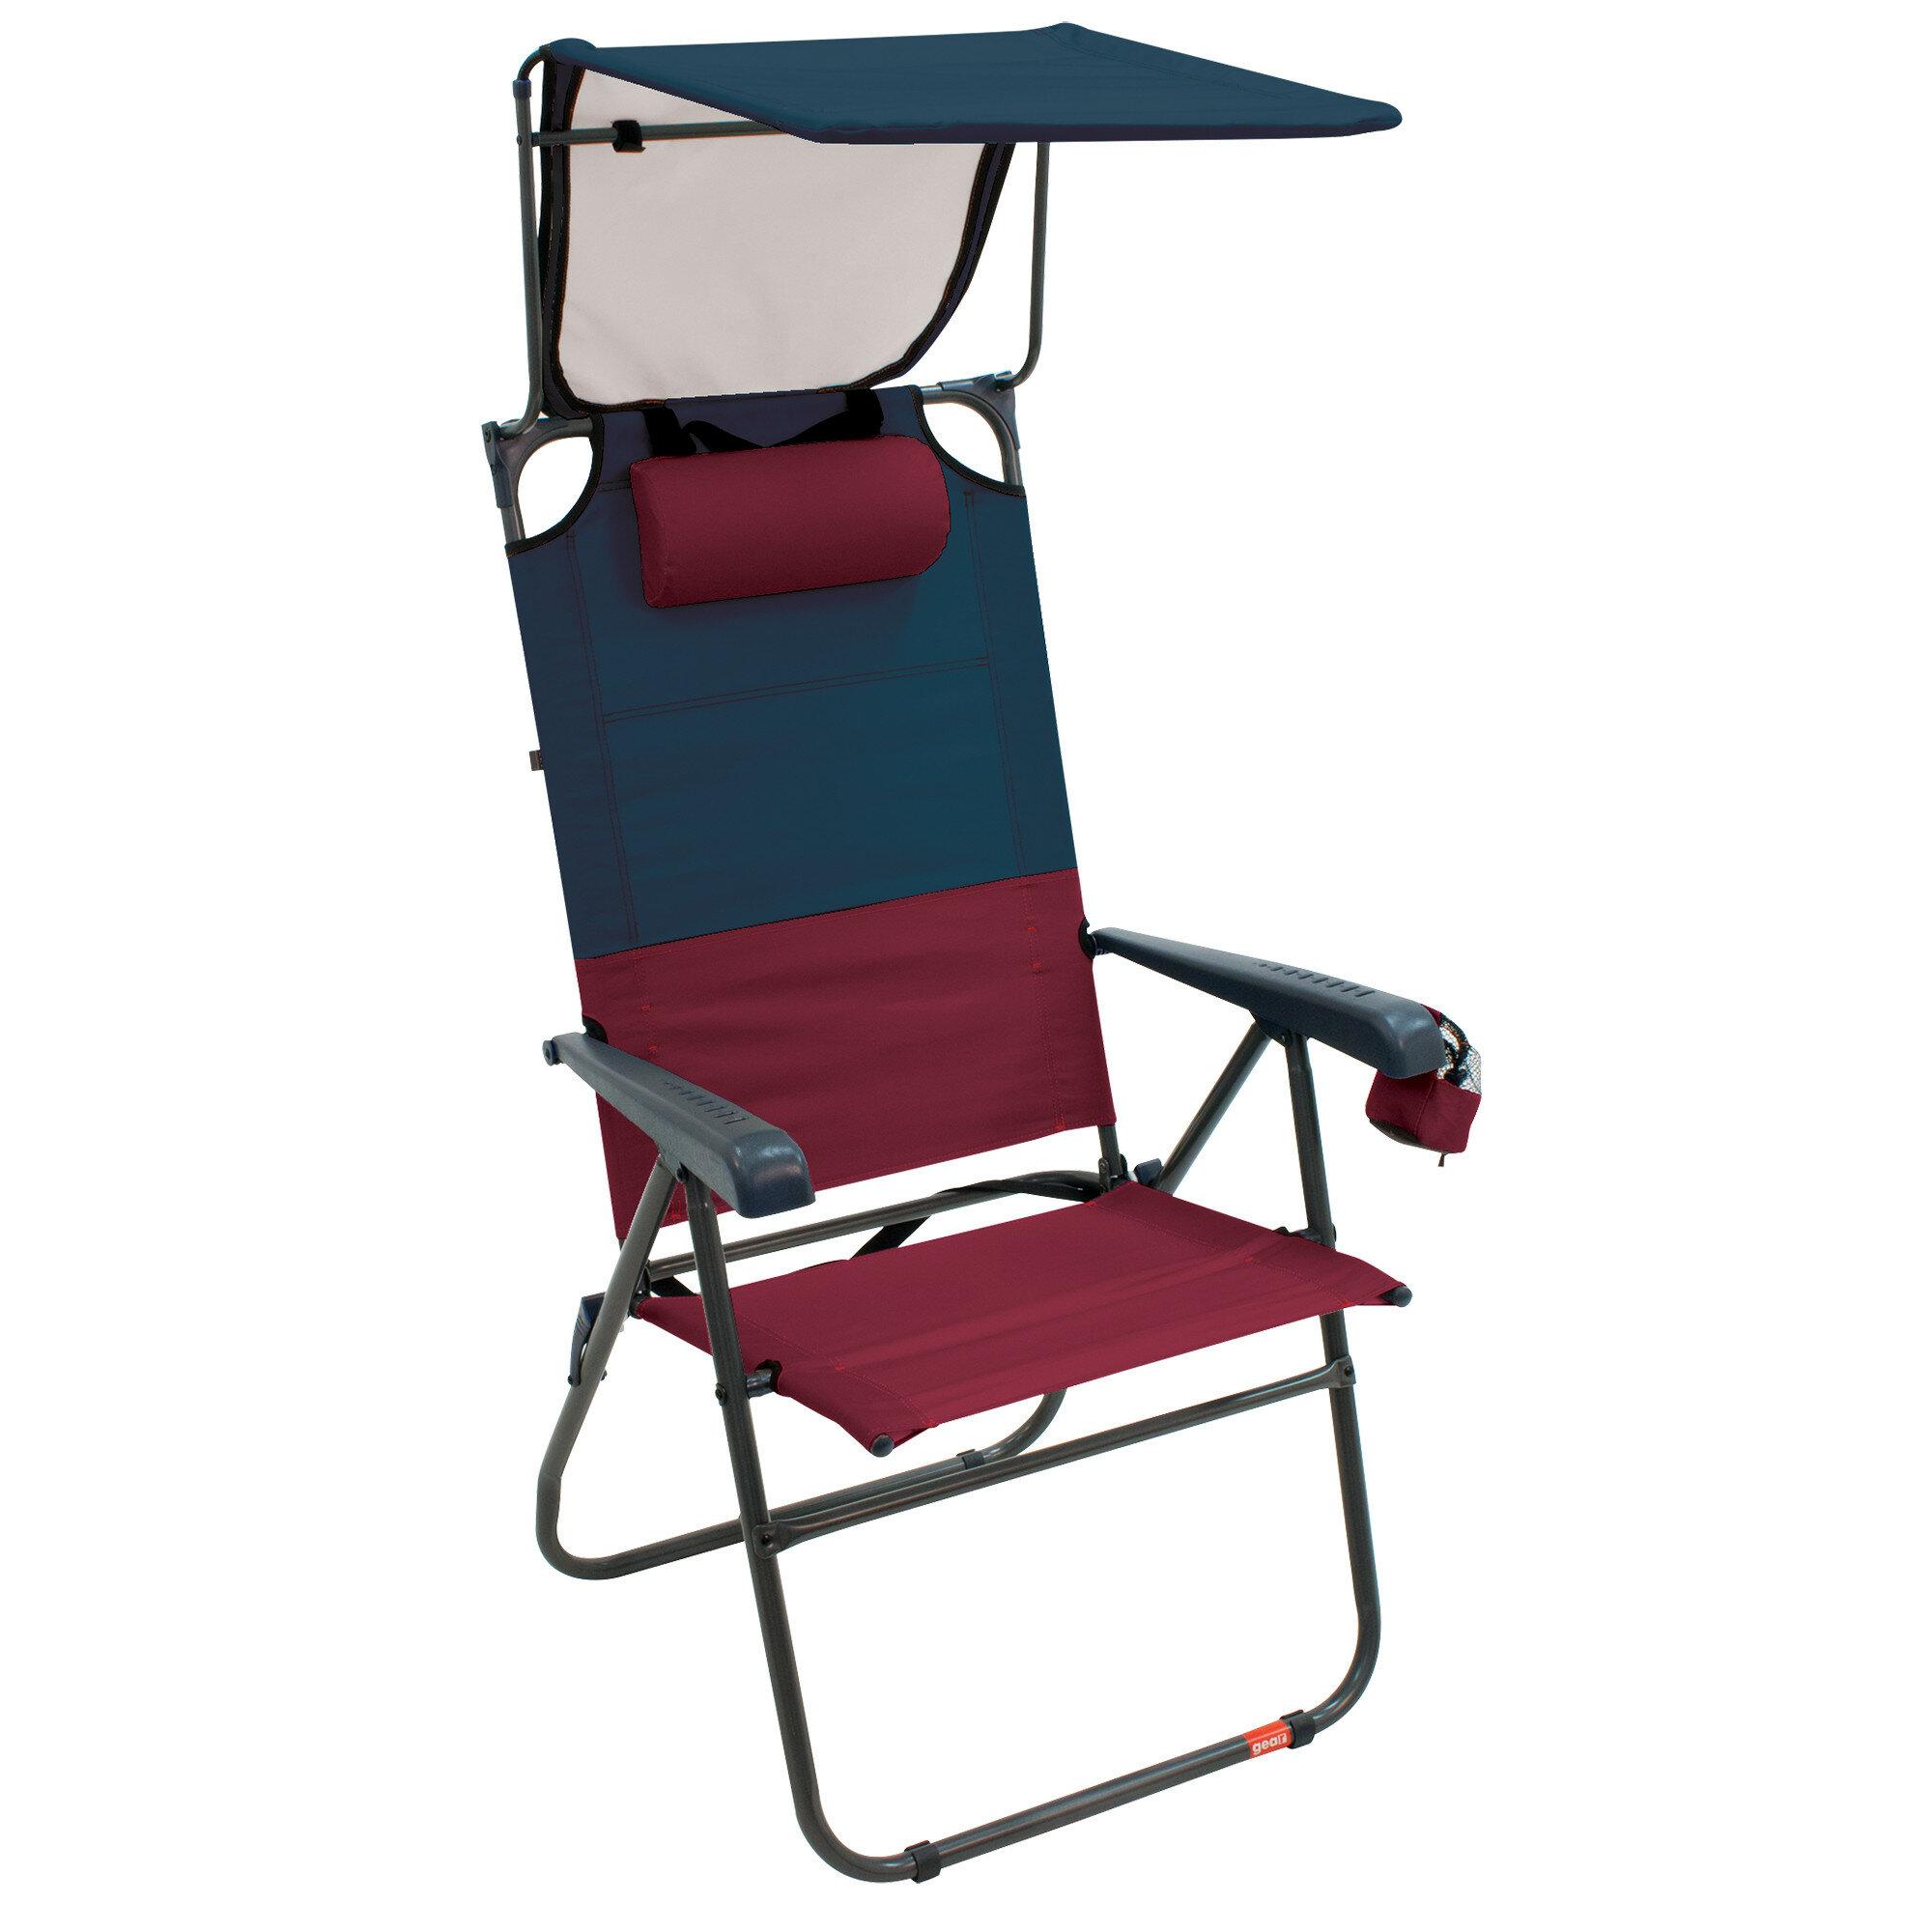 8905a163c7 Gear Hi-Boy Aluminum Canopy Reclining Beach Chair